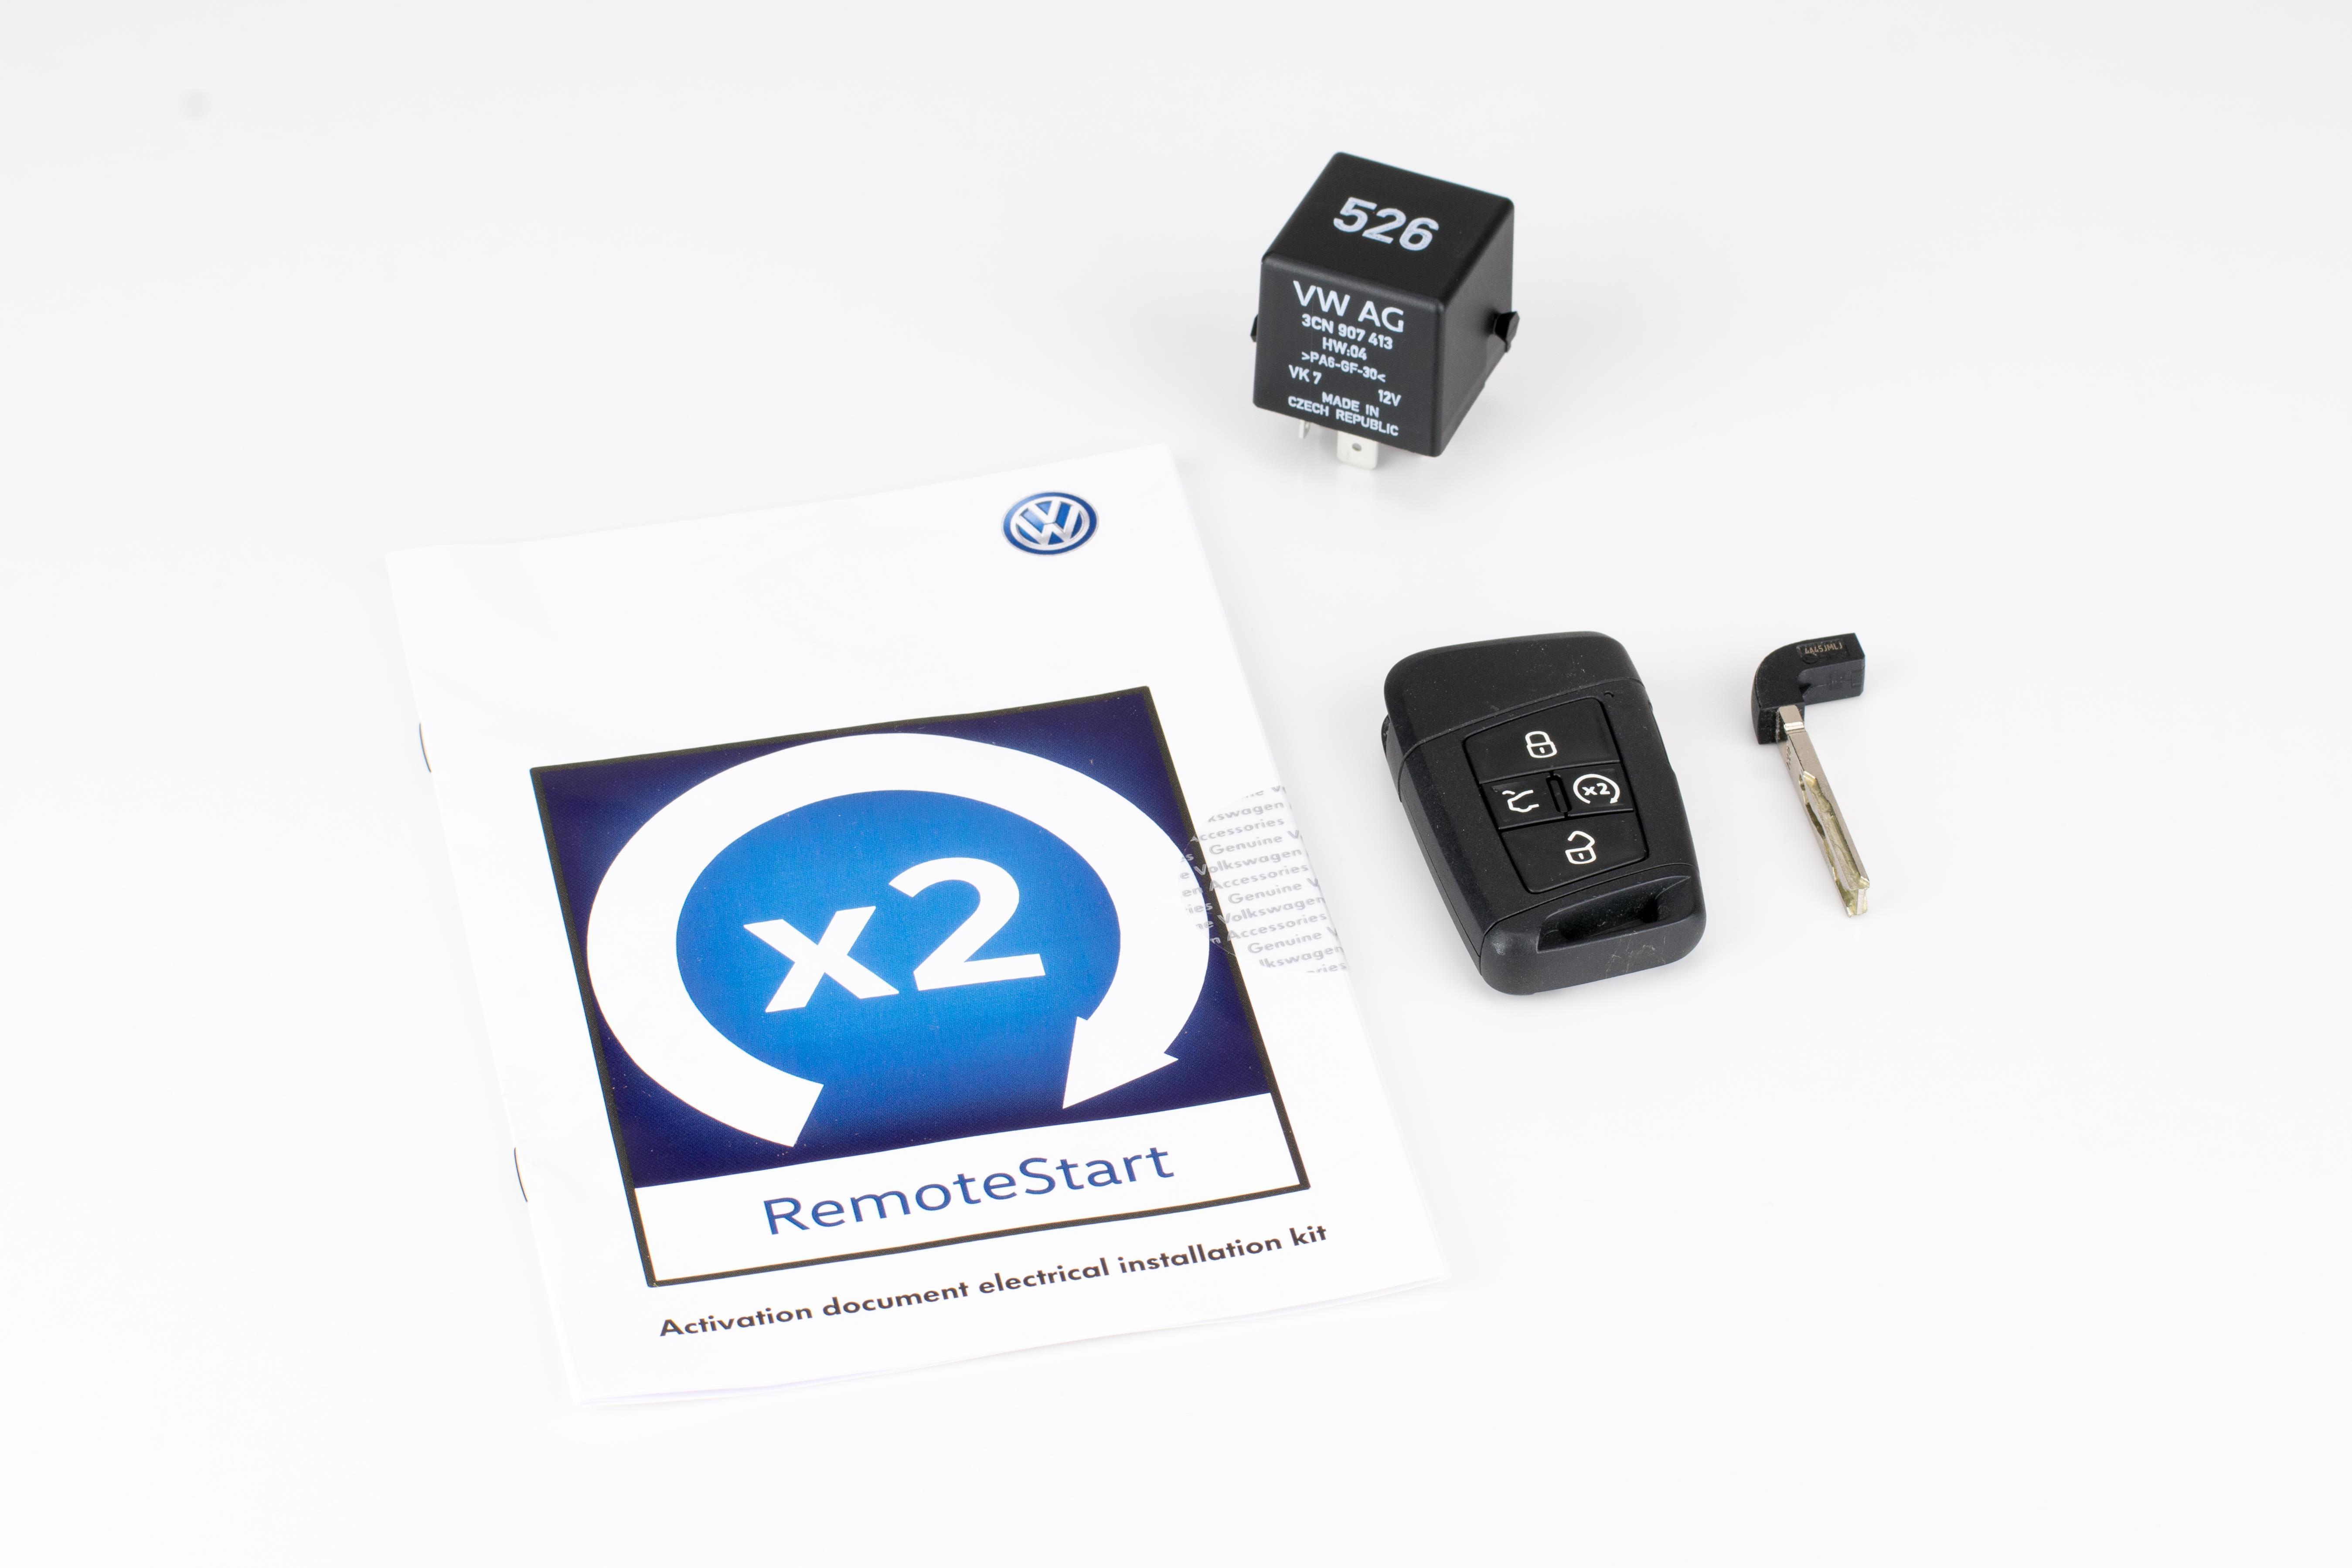 Volkswagen Remote Starter Diagram : Volkswagen tiguan remote start kit complete valet